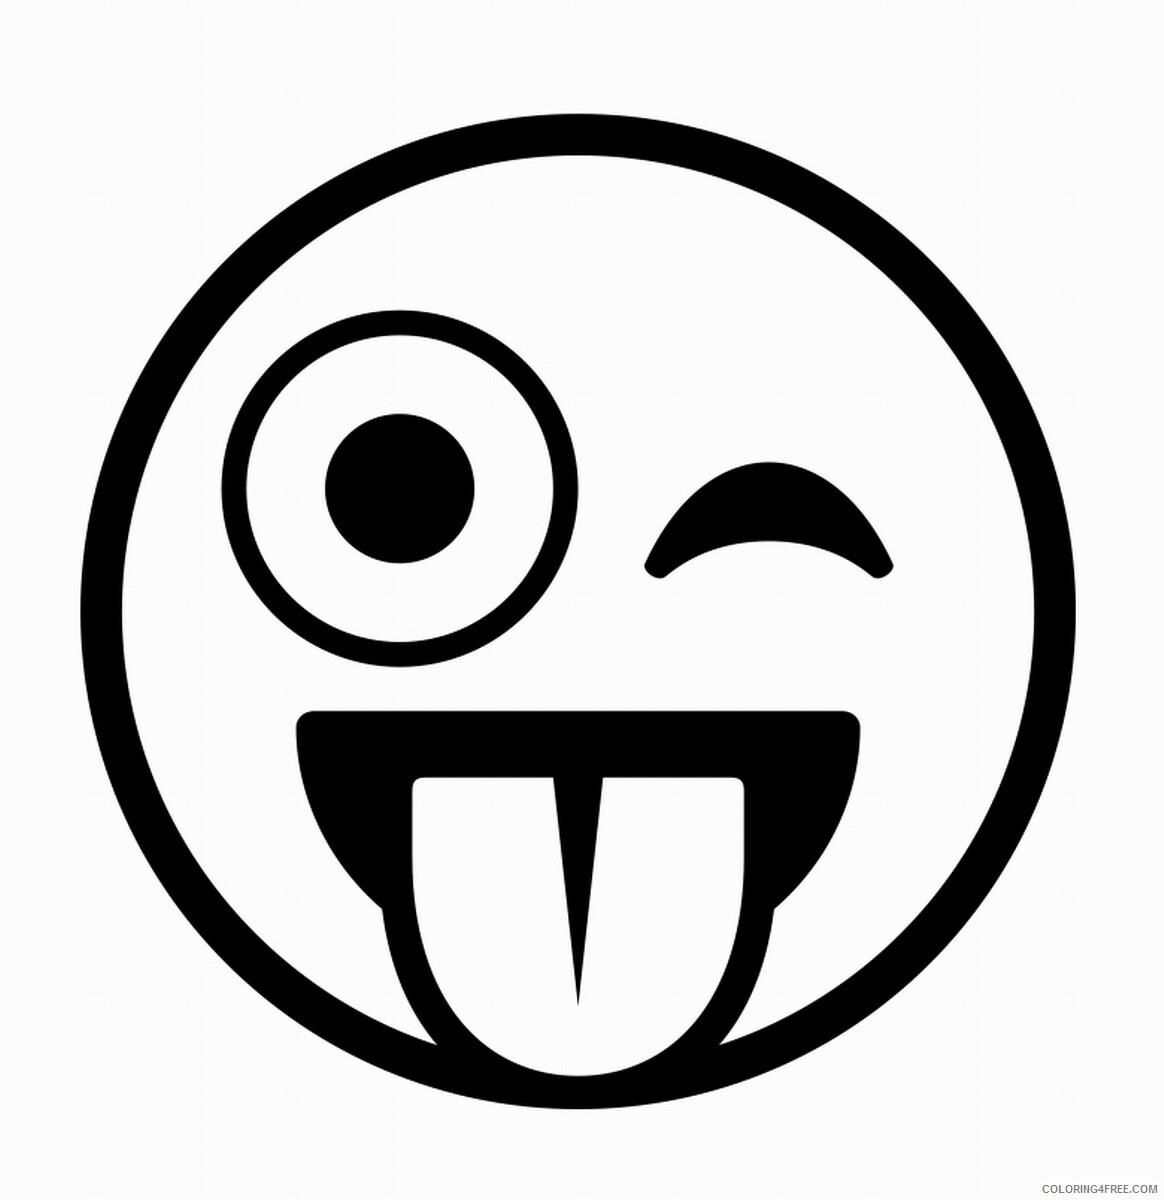 Emoji Coloring Pages emoji21 Printable 2021 2164 Coloring4free